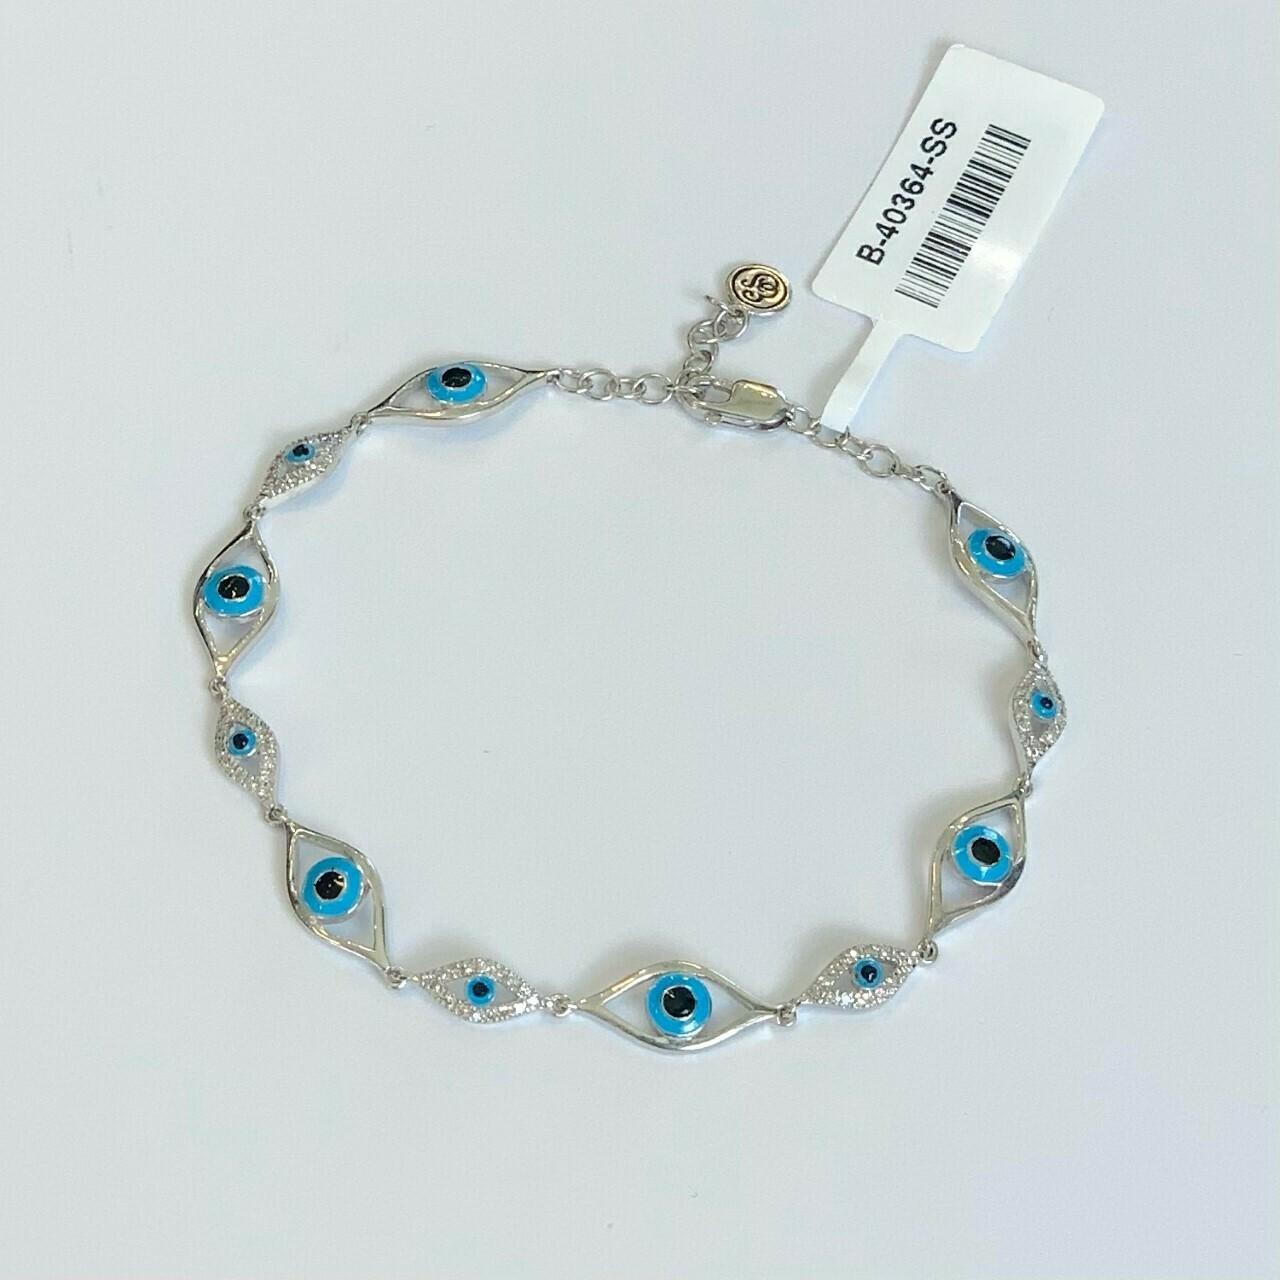 Ella Stein Eye of Protection Bracelet (Silver)